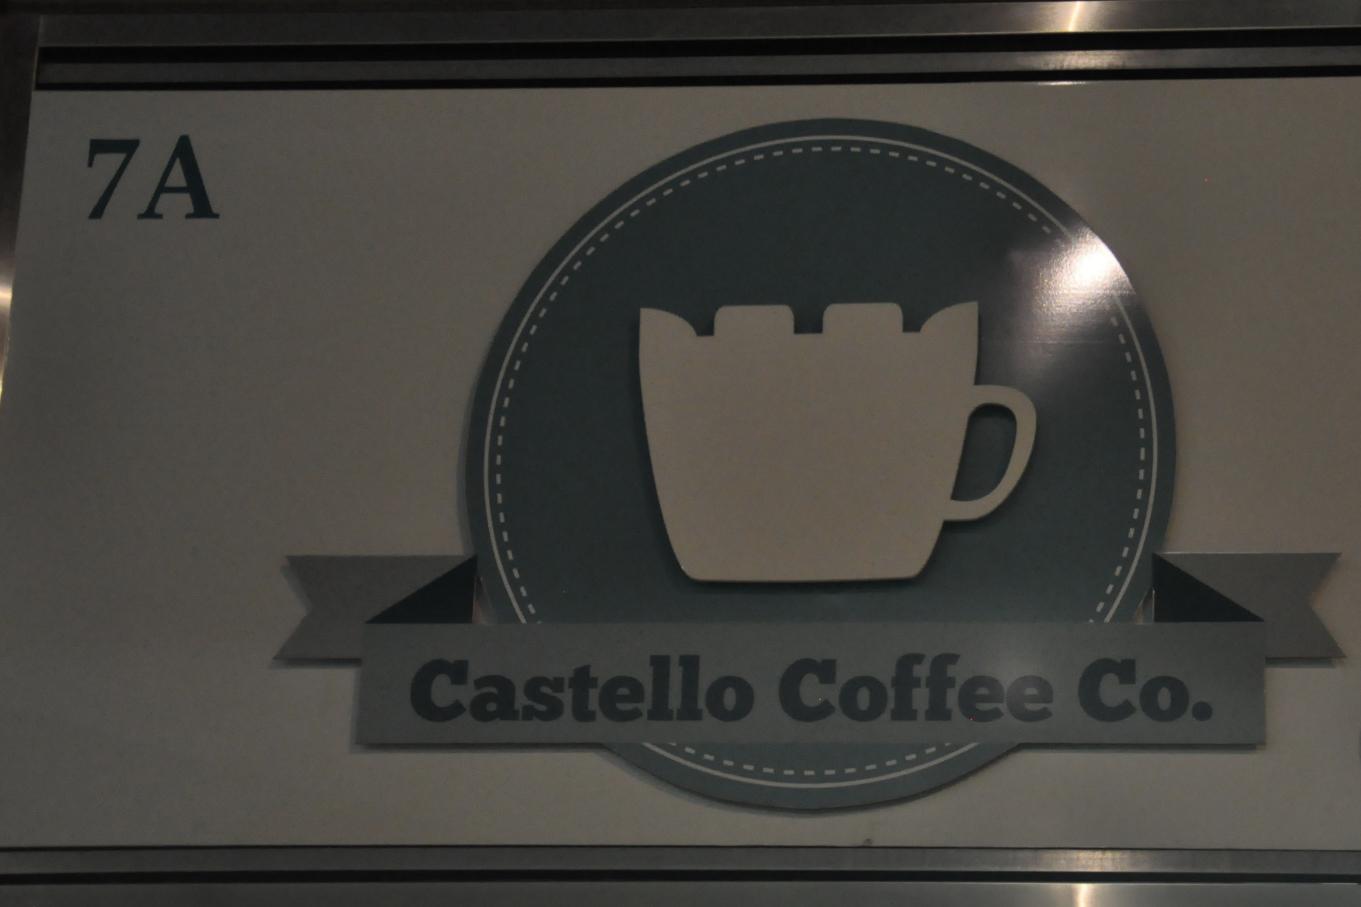 Castello Coffee's Logo at 7A Castle Street